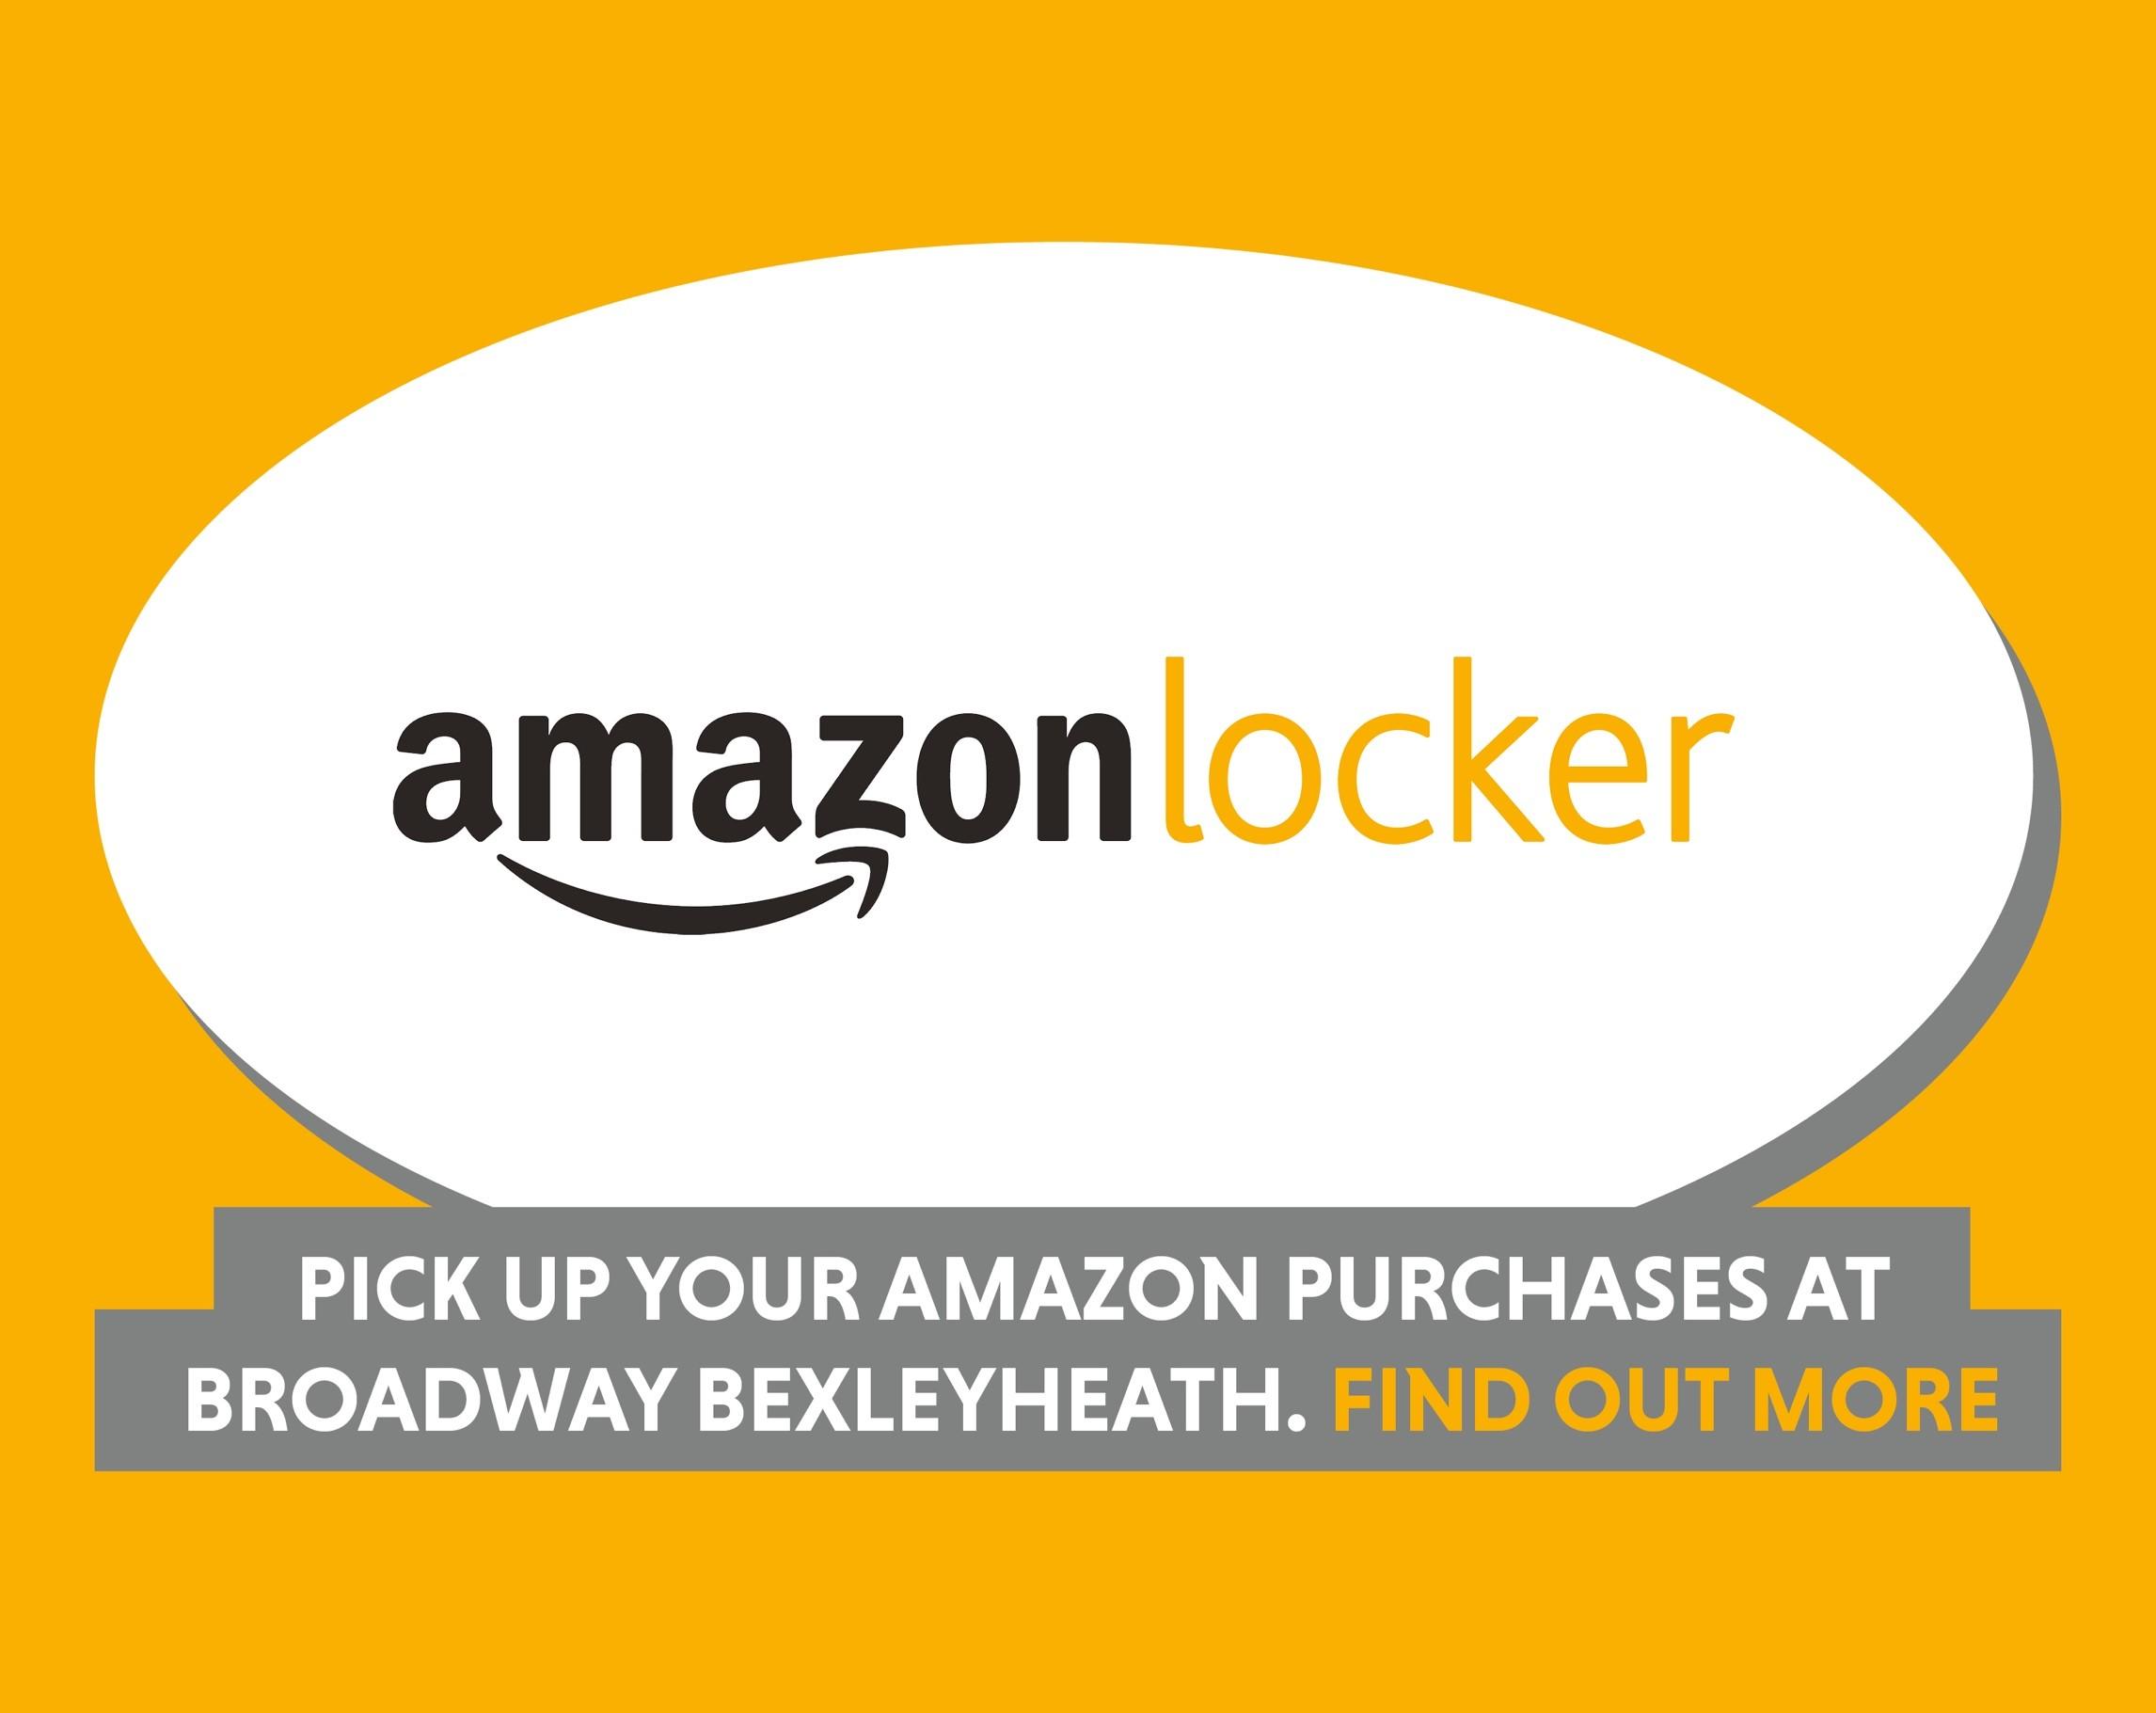 Amazon-locker -slider